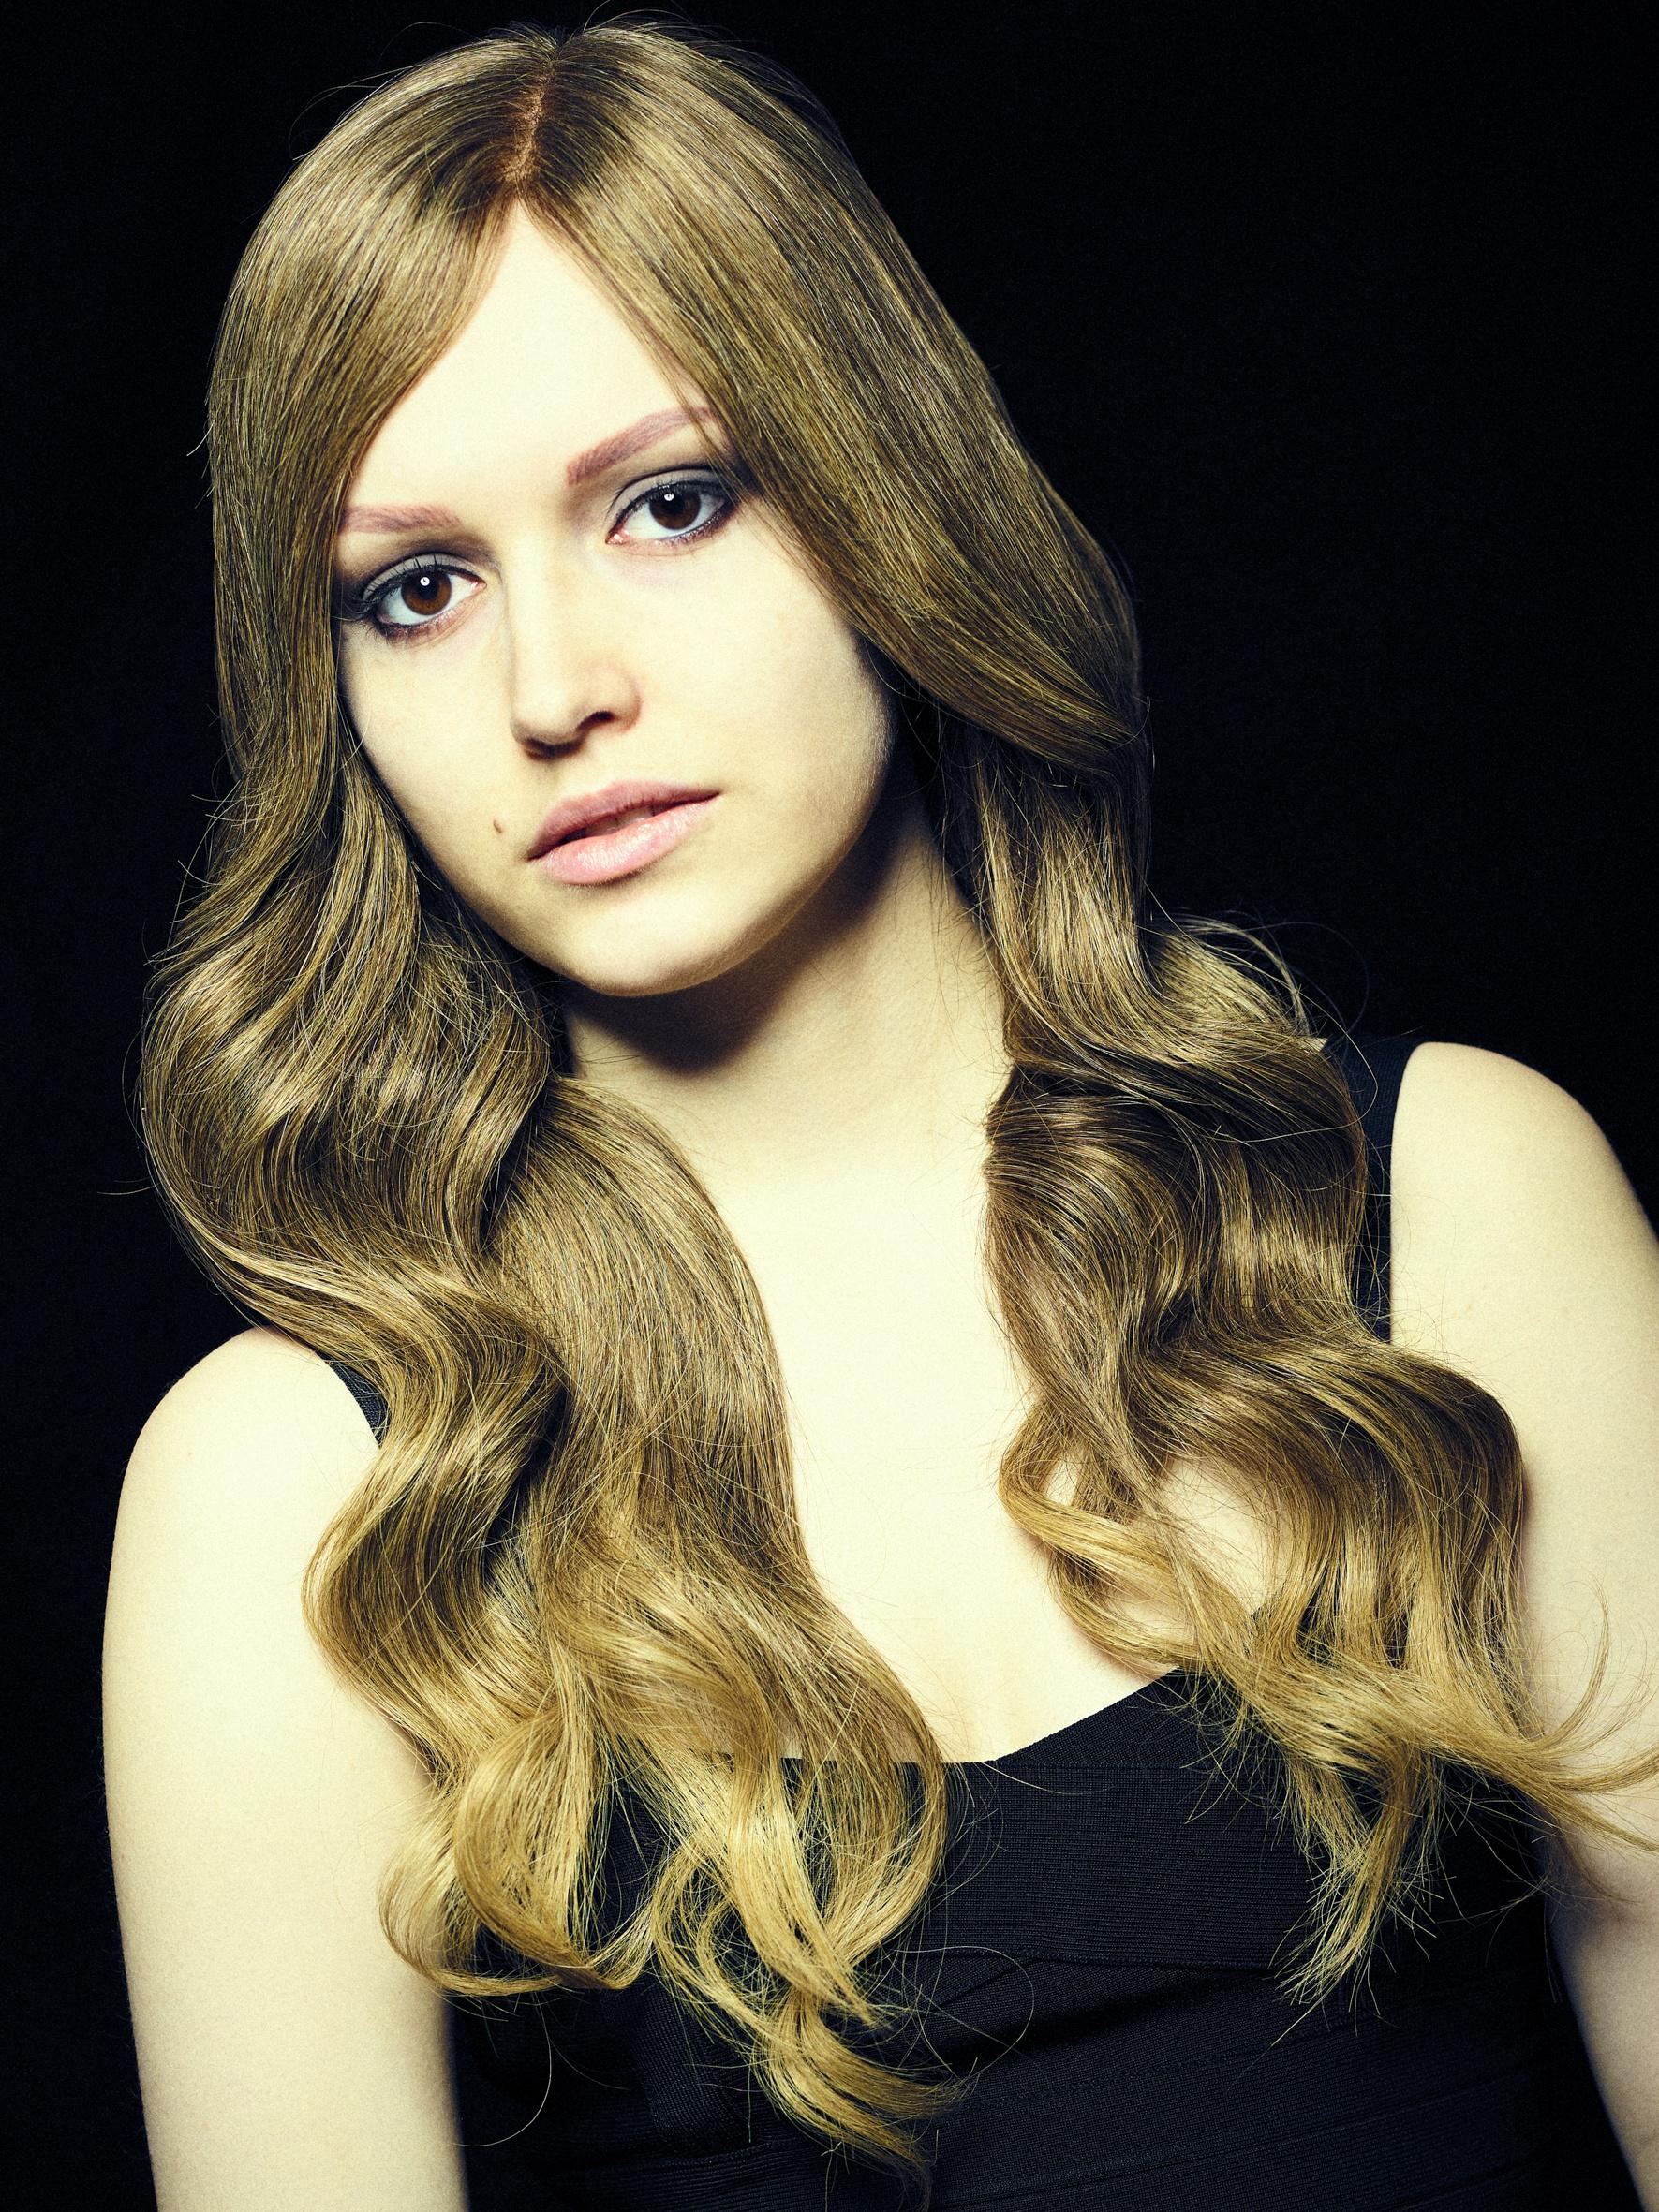 Sofia er modell med alopecia. Her med langt mørkeblond parykk